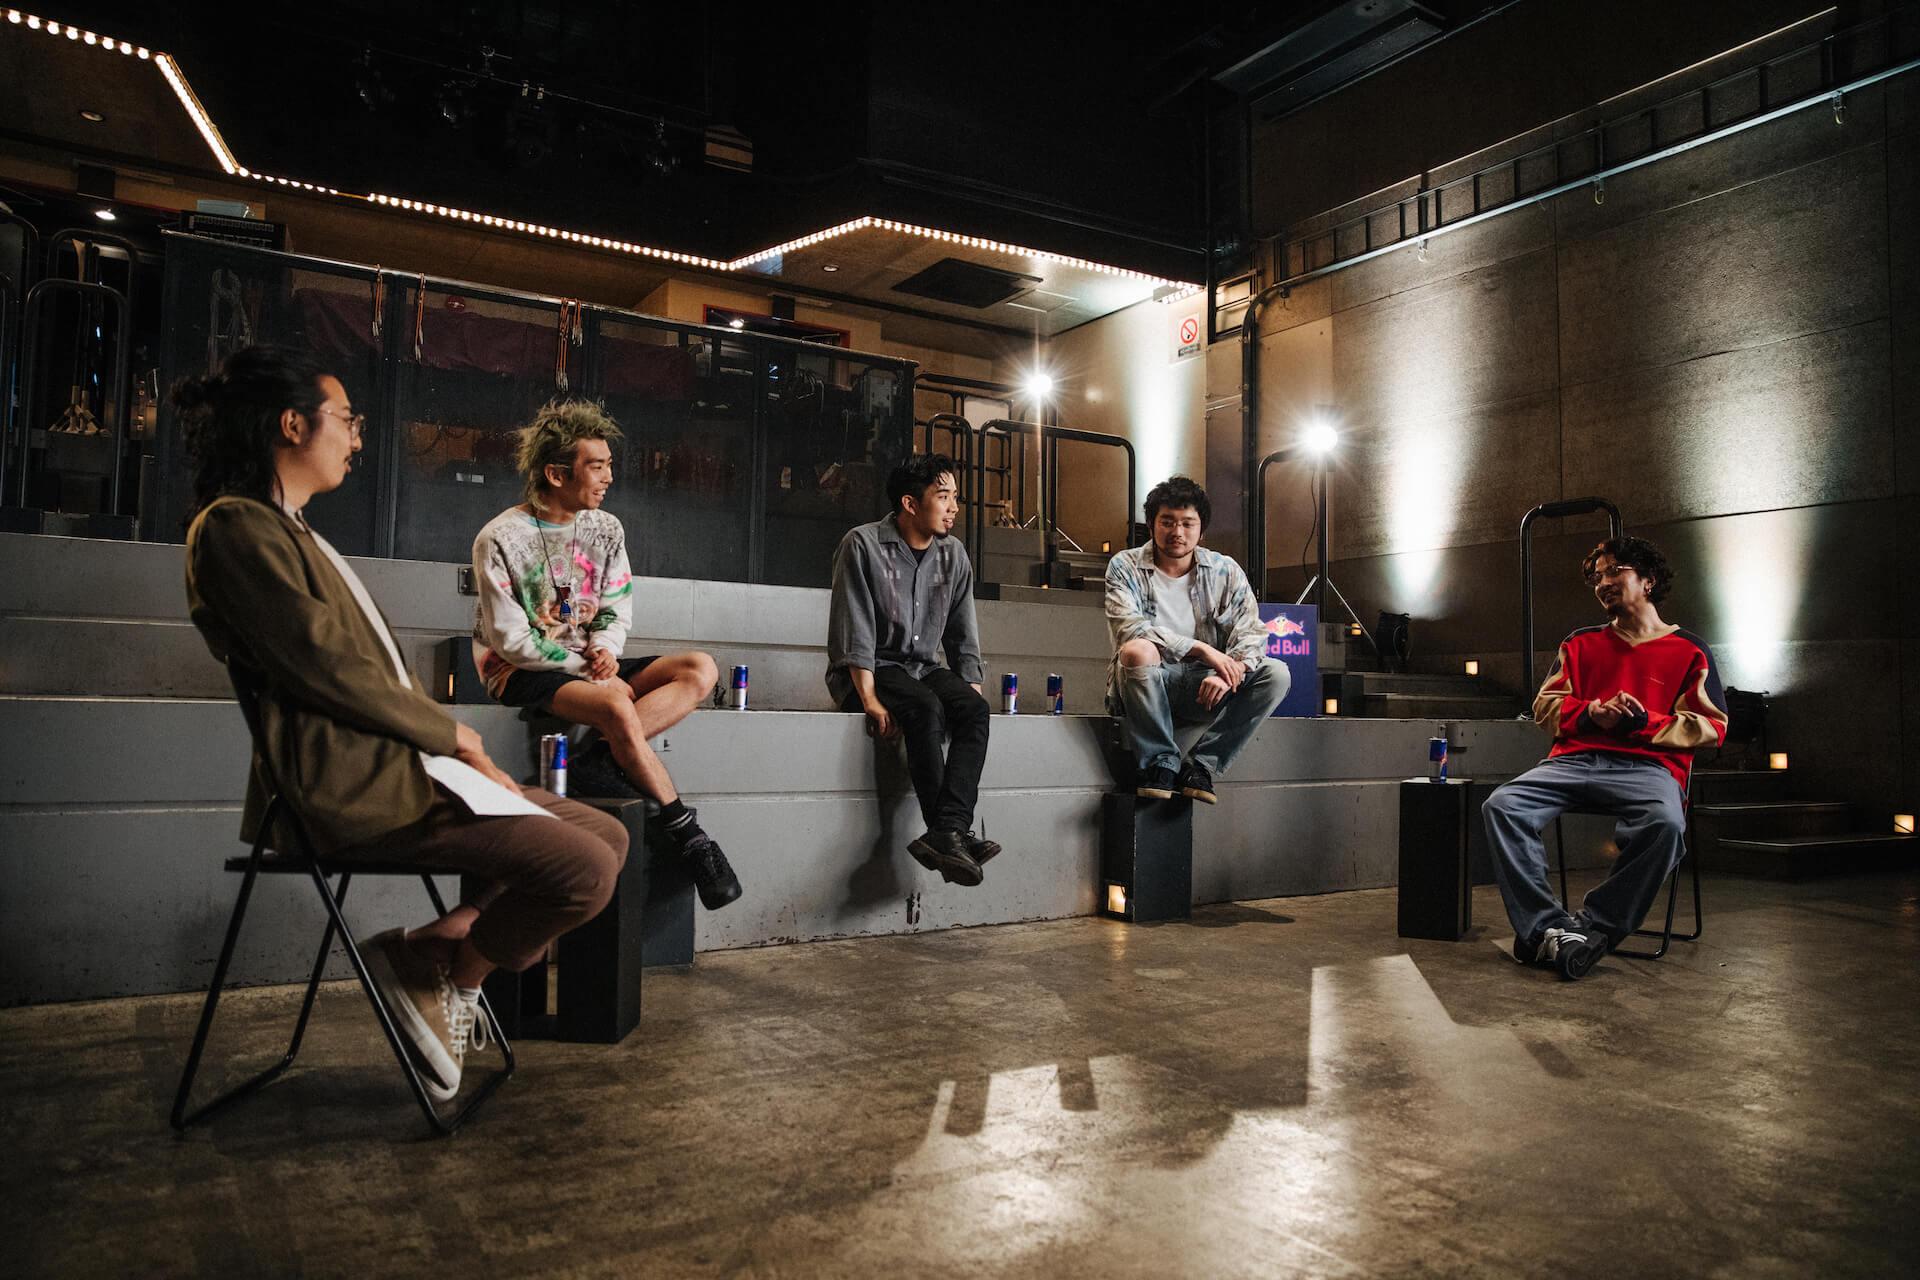 "King Gnuが日本アーティスト史上初めてRed Bullとパートナーシップを締結!""Go Louder""プロジェクトでインタビュー公開&コラボグッズプレゼントも music200908_kinggnu_redbull_10"